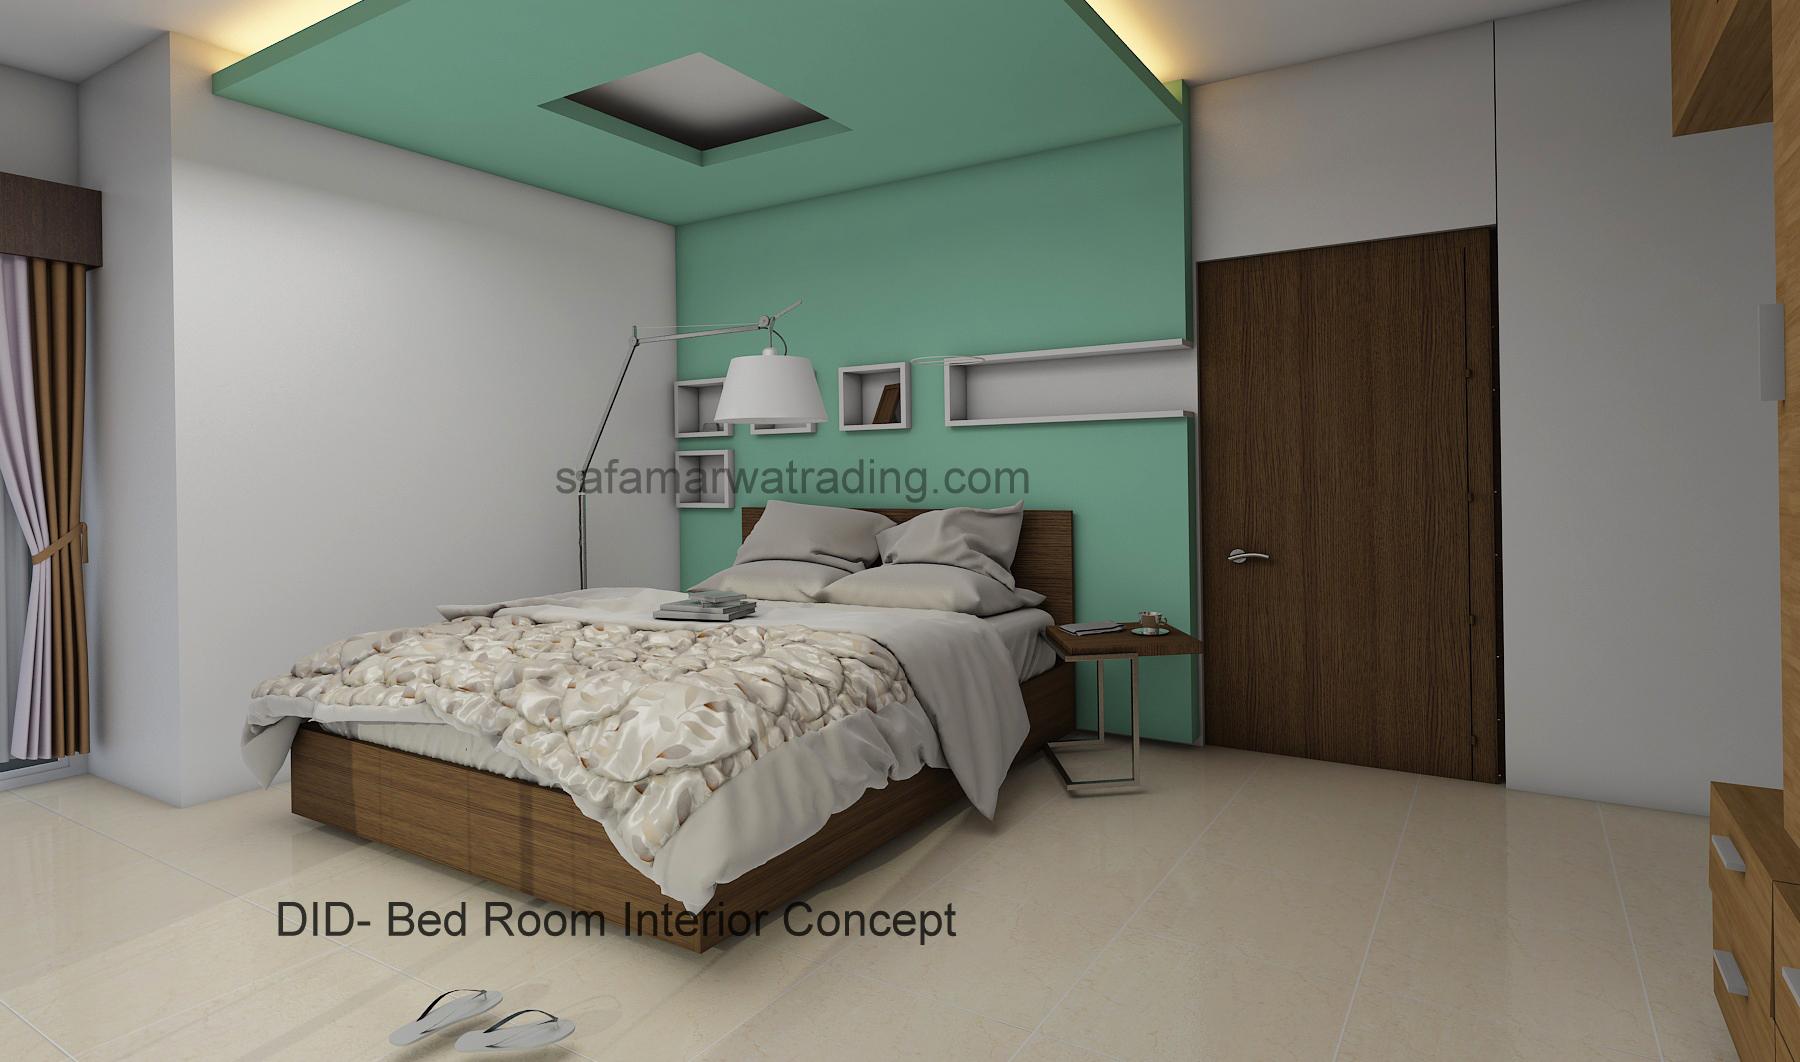 Bed Room Interior Concept